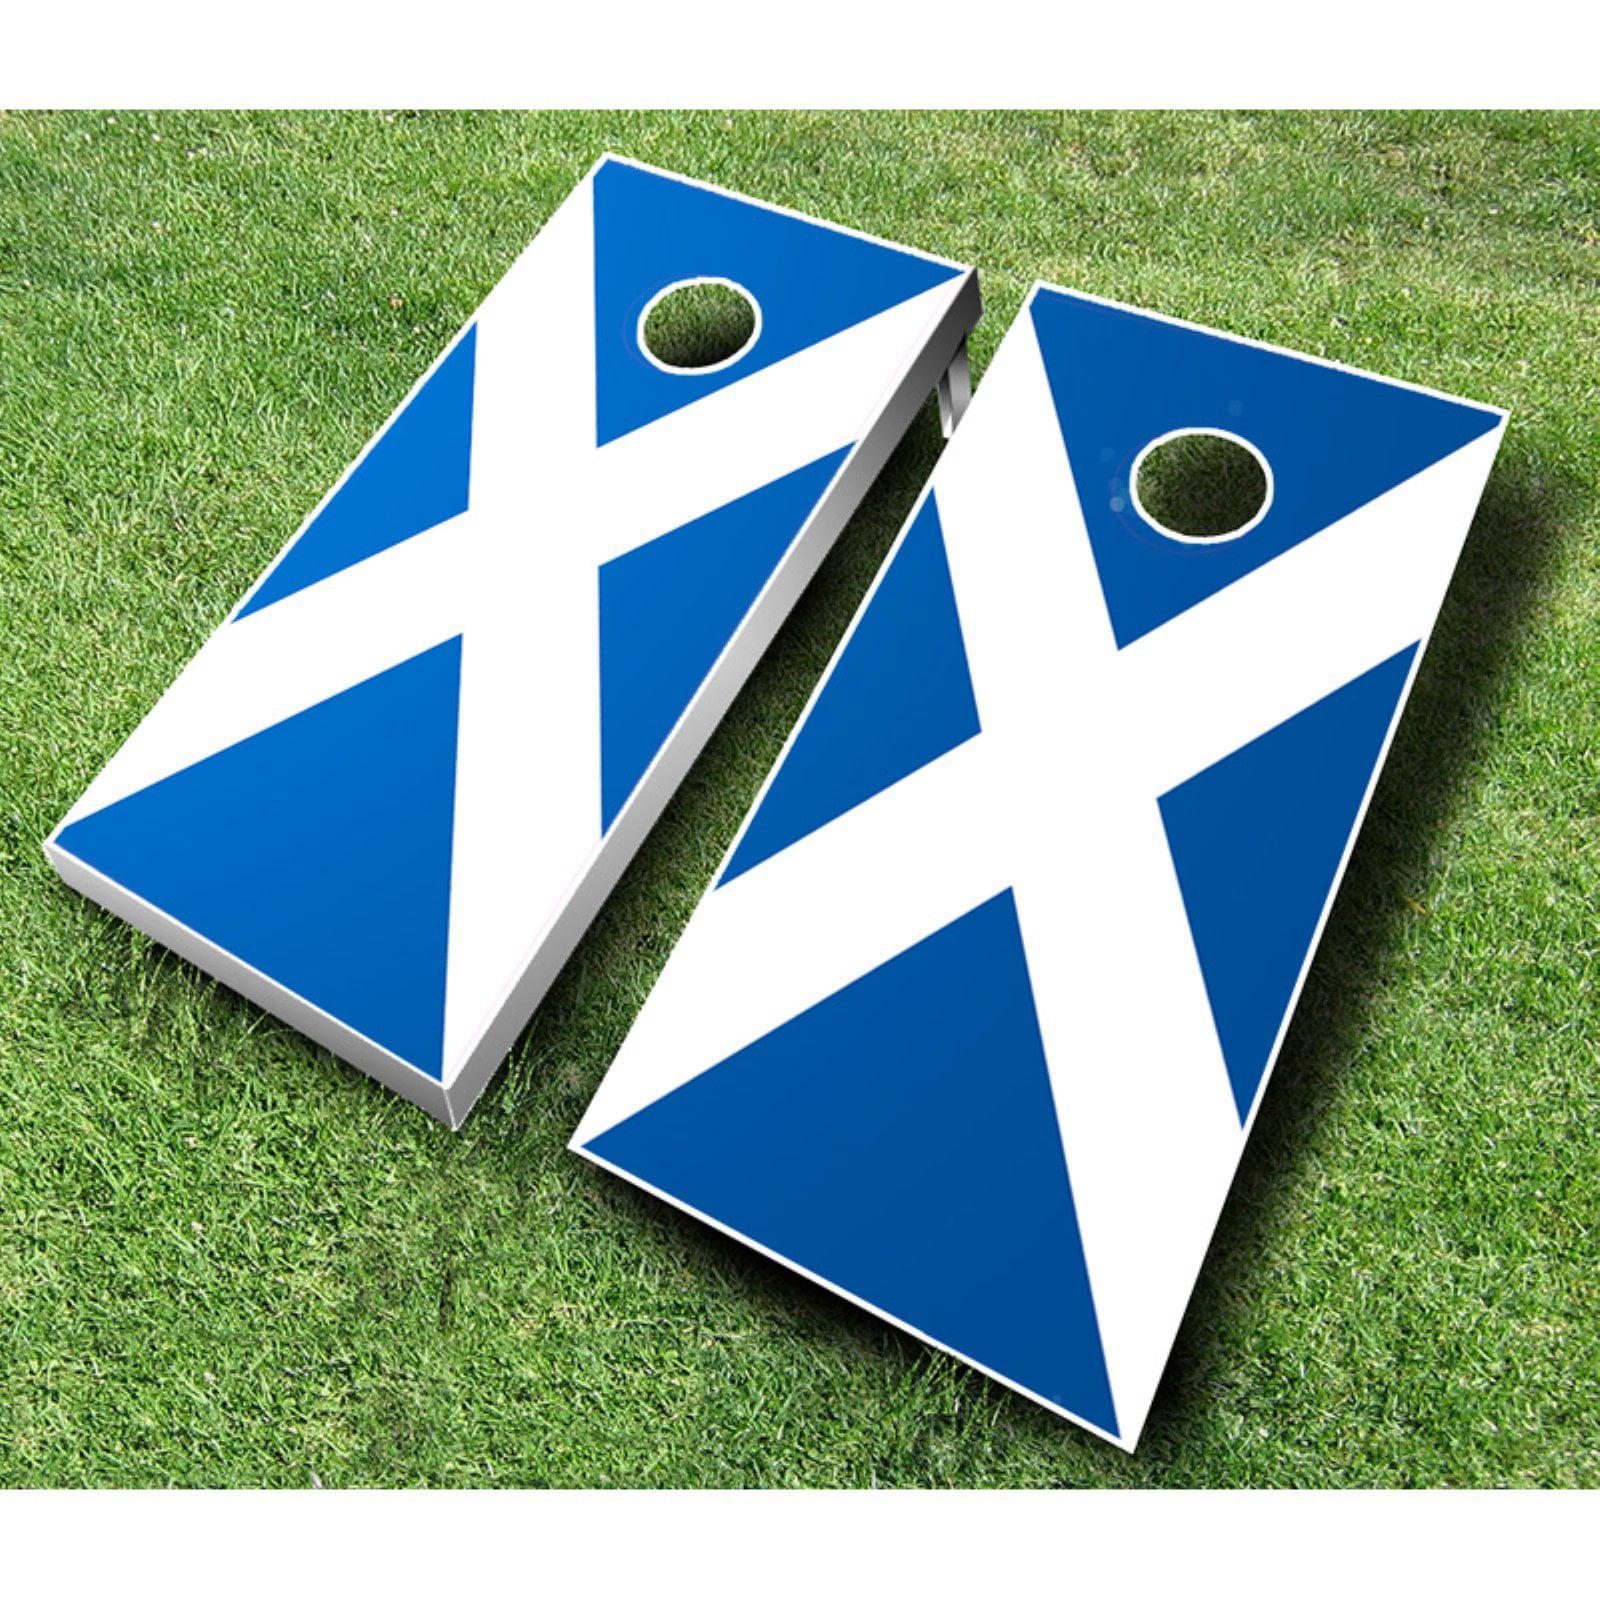 Scottish Flag Cornhole Set with Bags by AJJ Cornhole